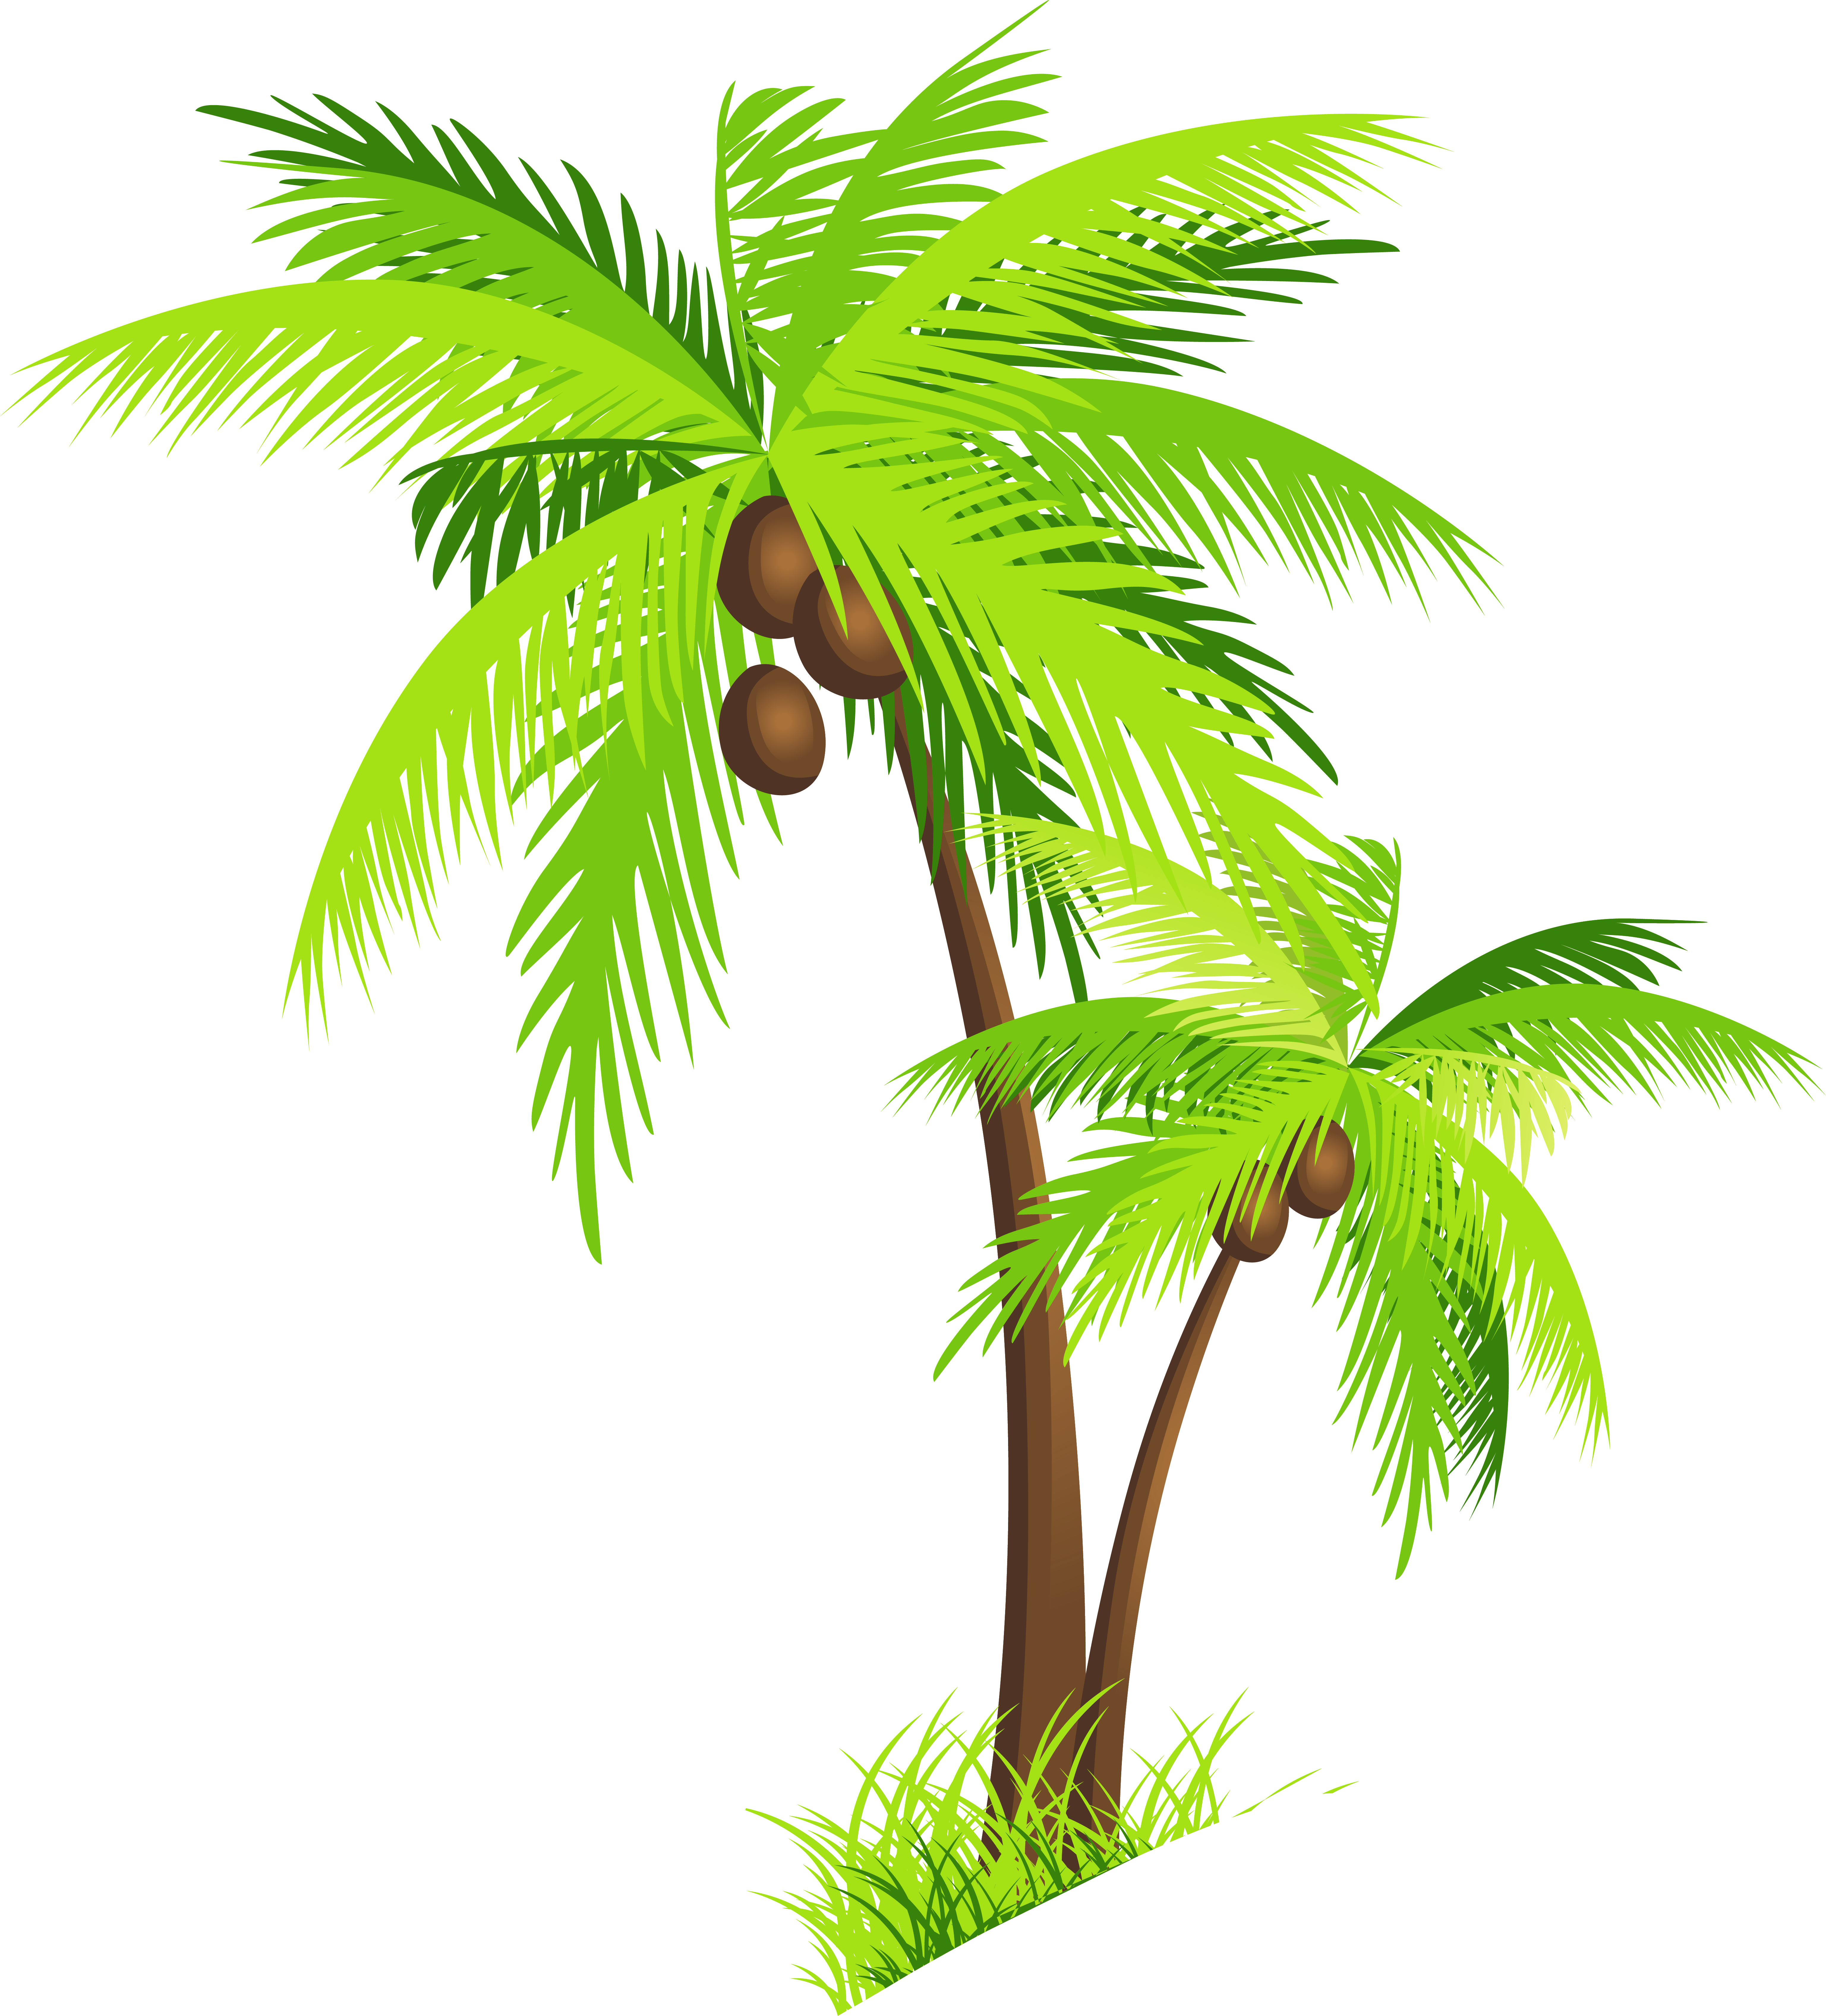 clipart black and white Png piante alberi pinterest. Beach clipart coconut tree.